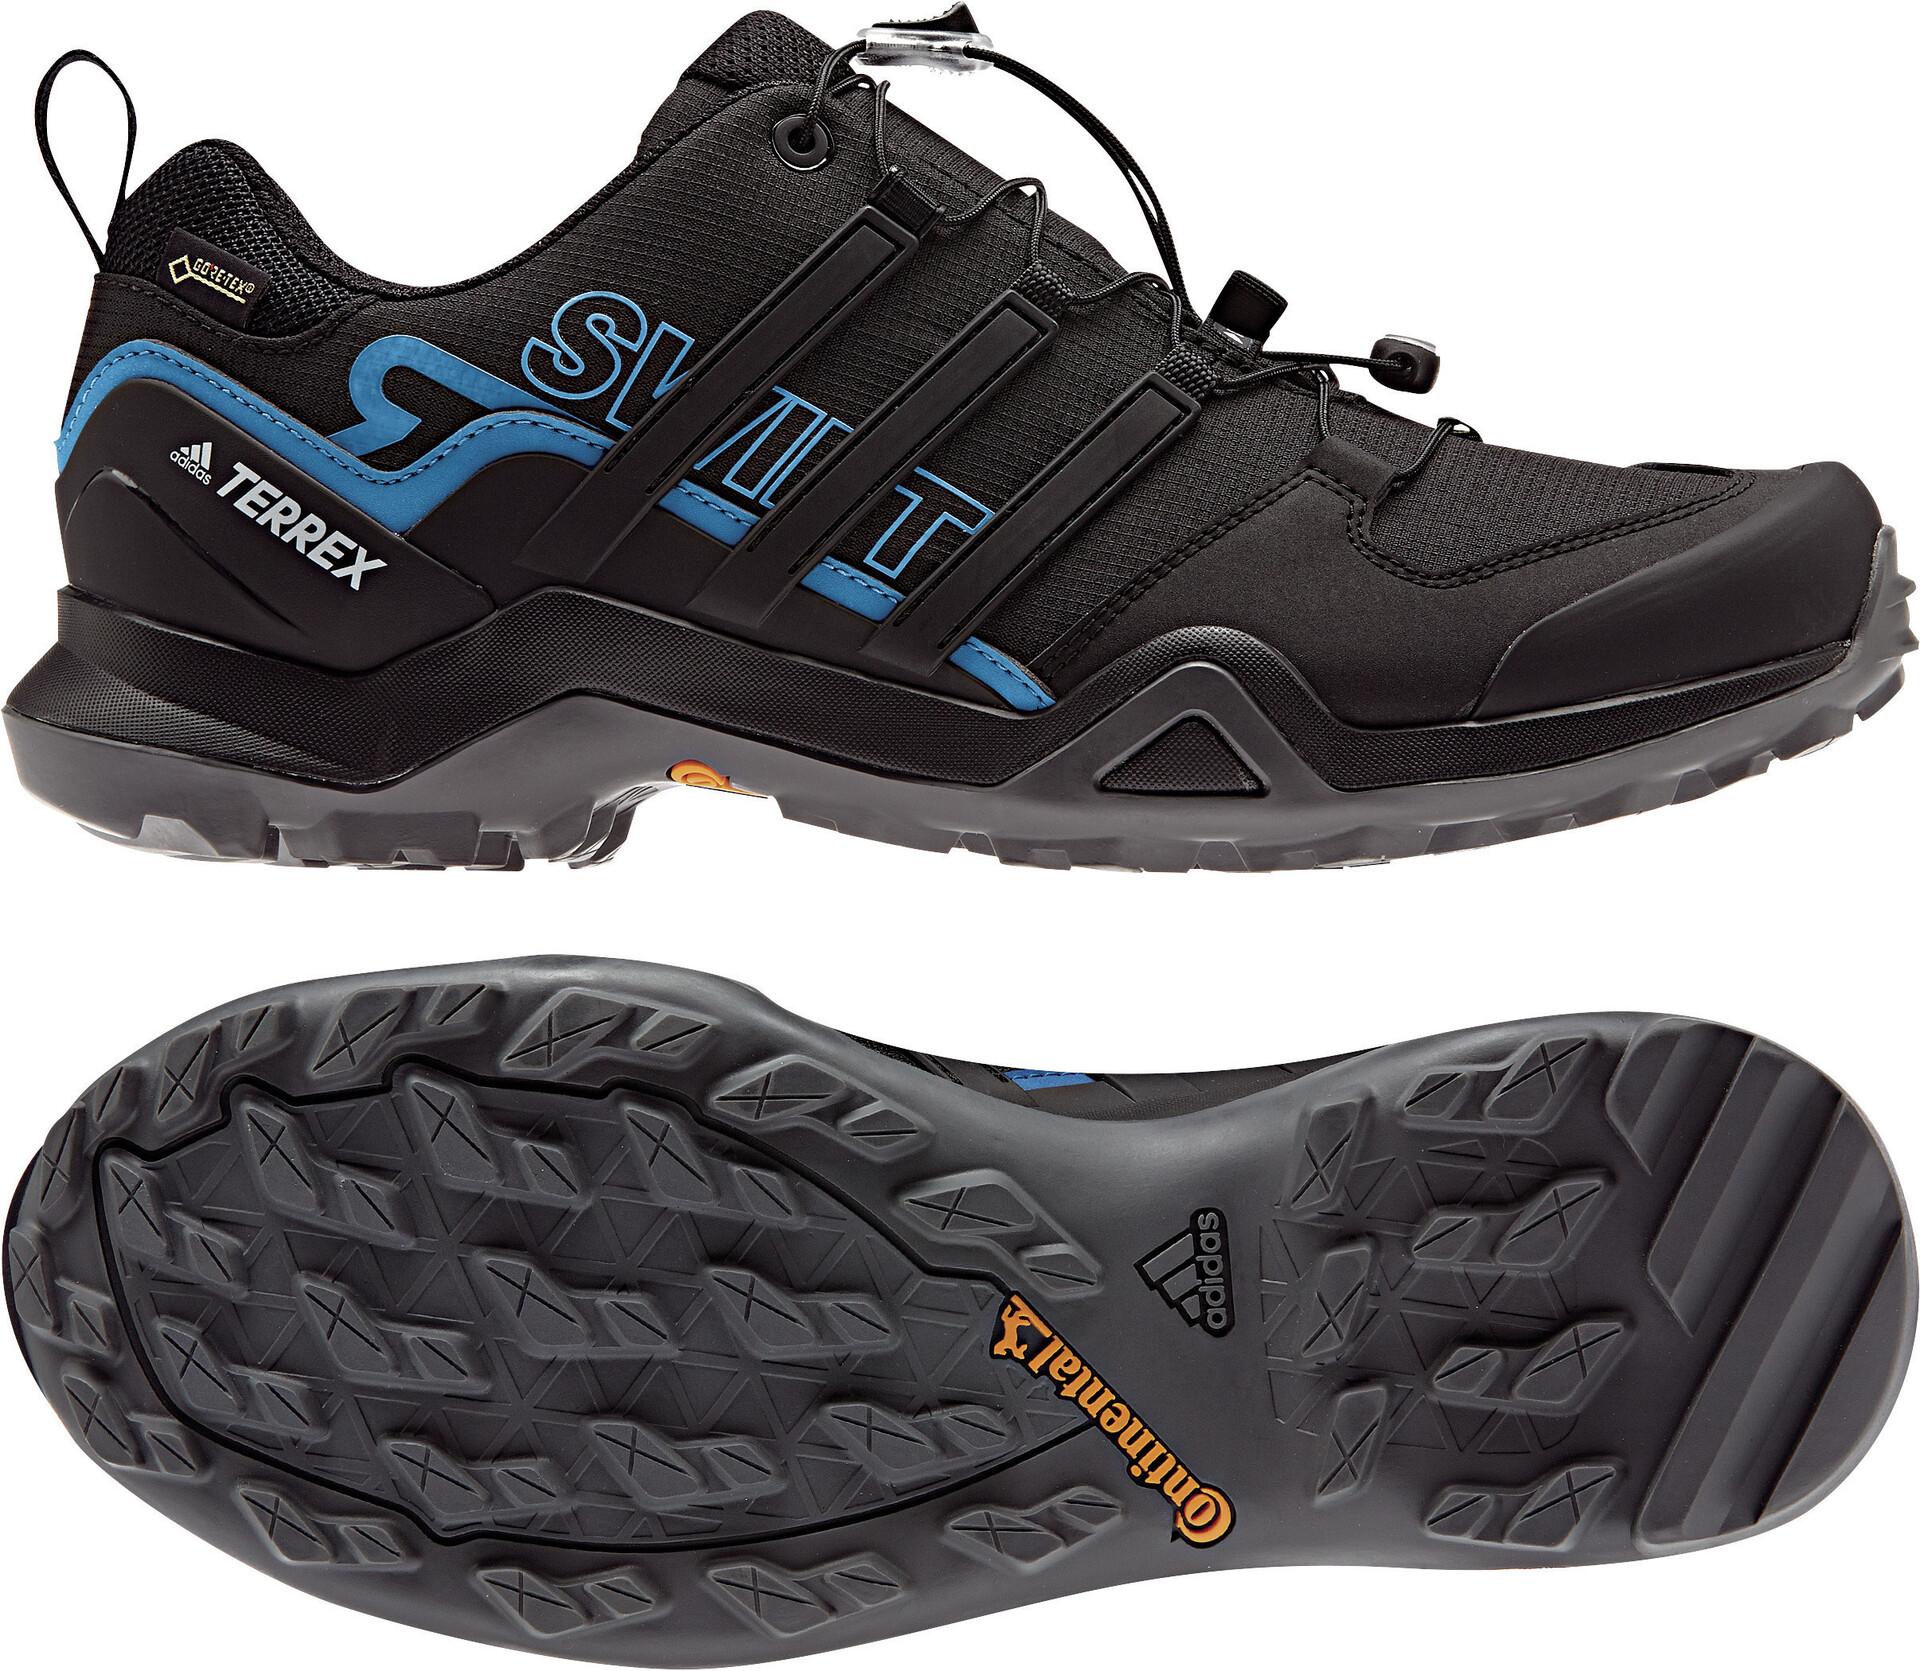 new arrival baa98 1bba5 ... reduced adidas terrex swift r2 gtx chaussures homme noir 9e6b9 a77f2